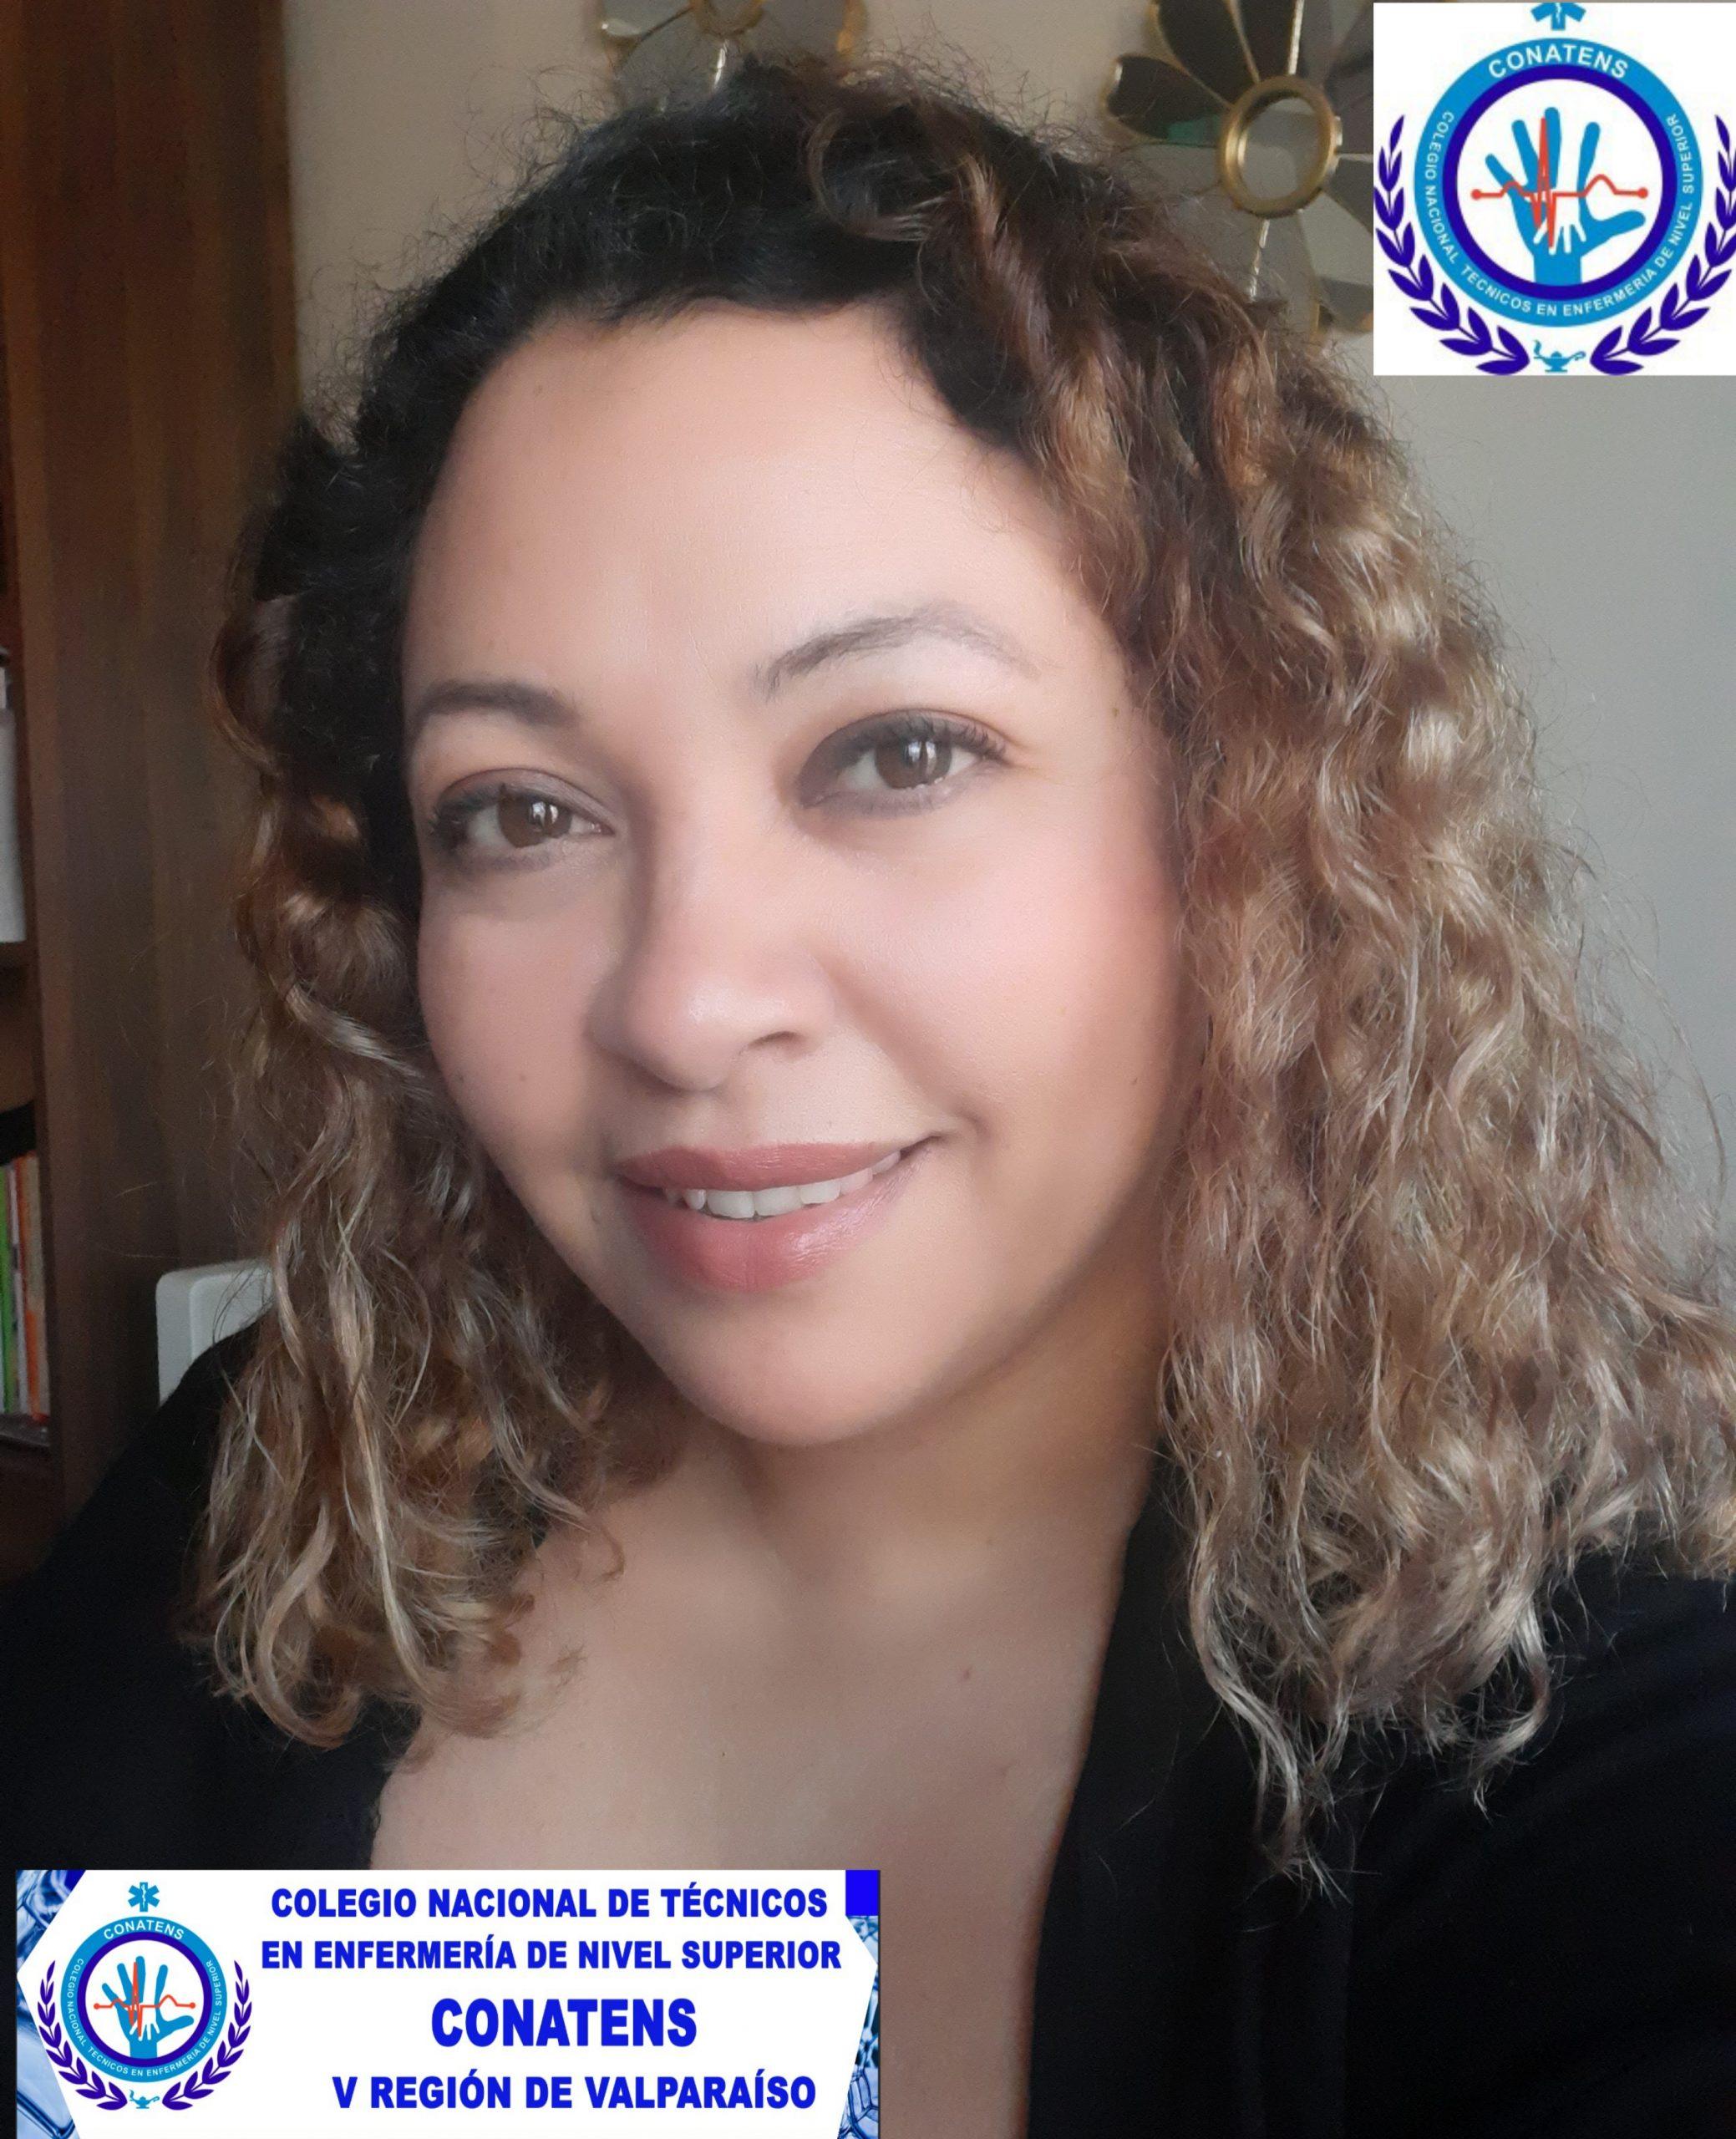 Ximena Roblero Rojas